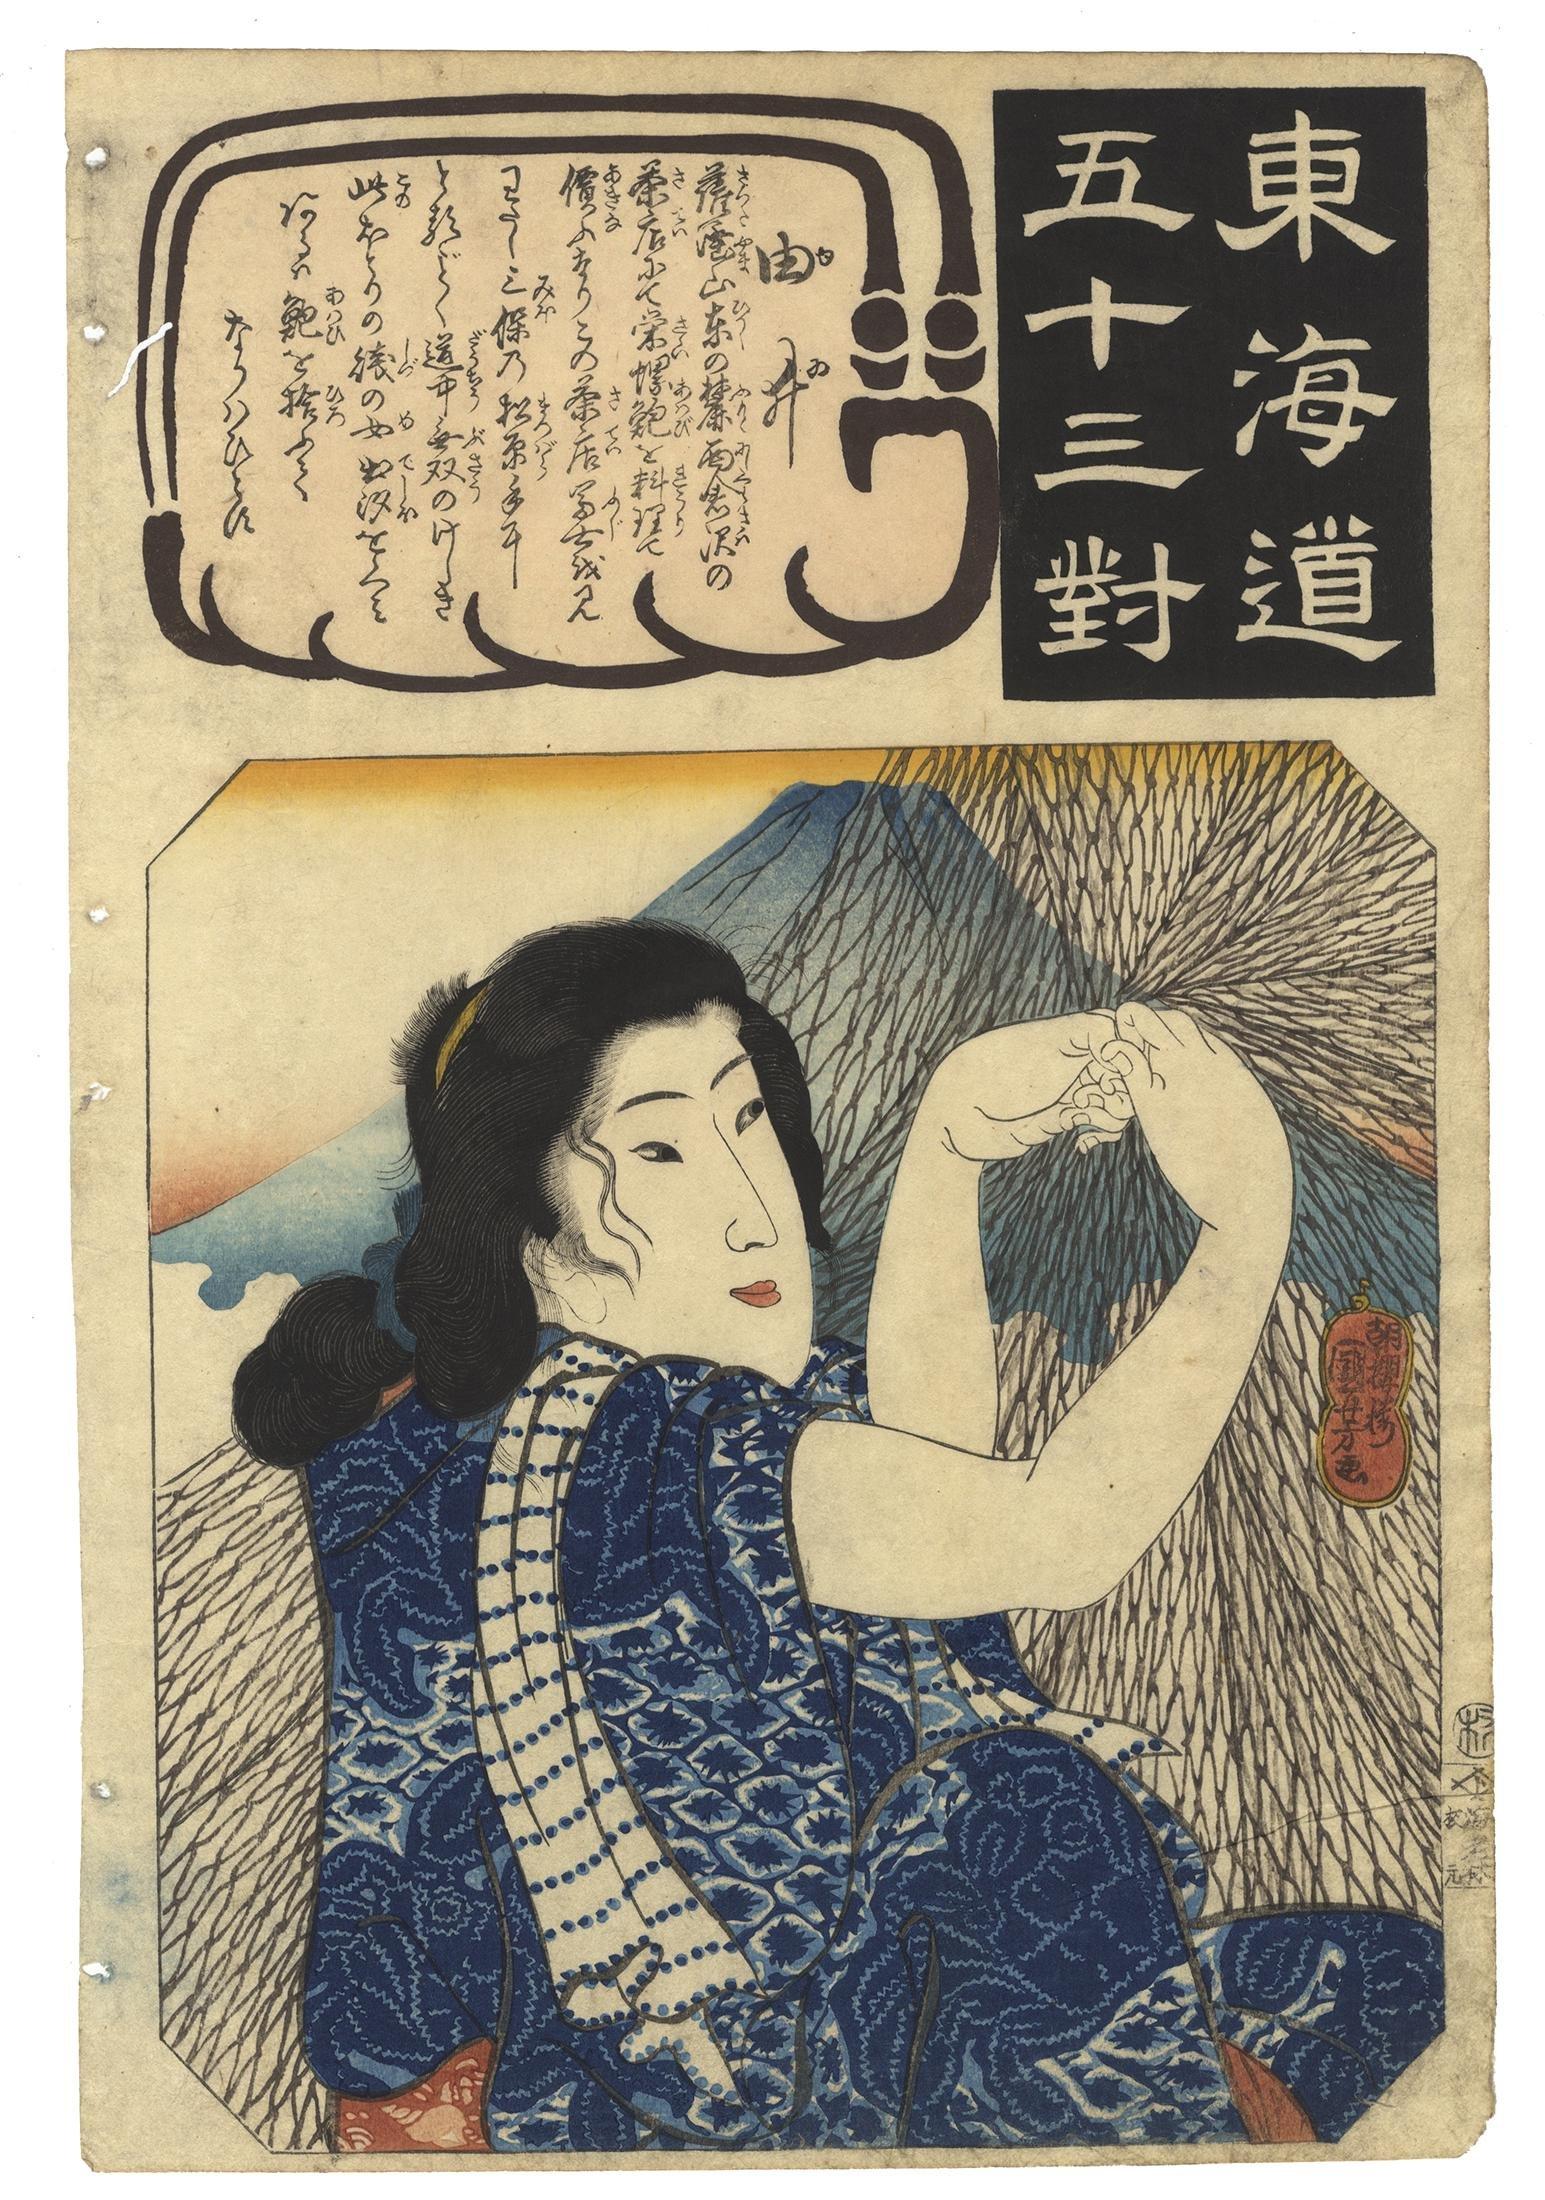 Kuniyoshi Utagawa, Travel, Yui, Fifty-Three Parallels